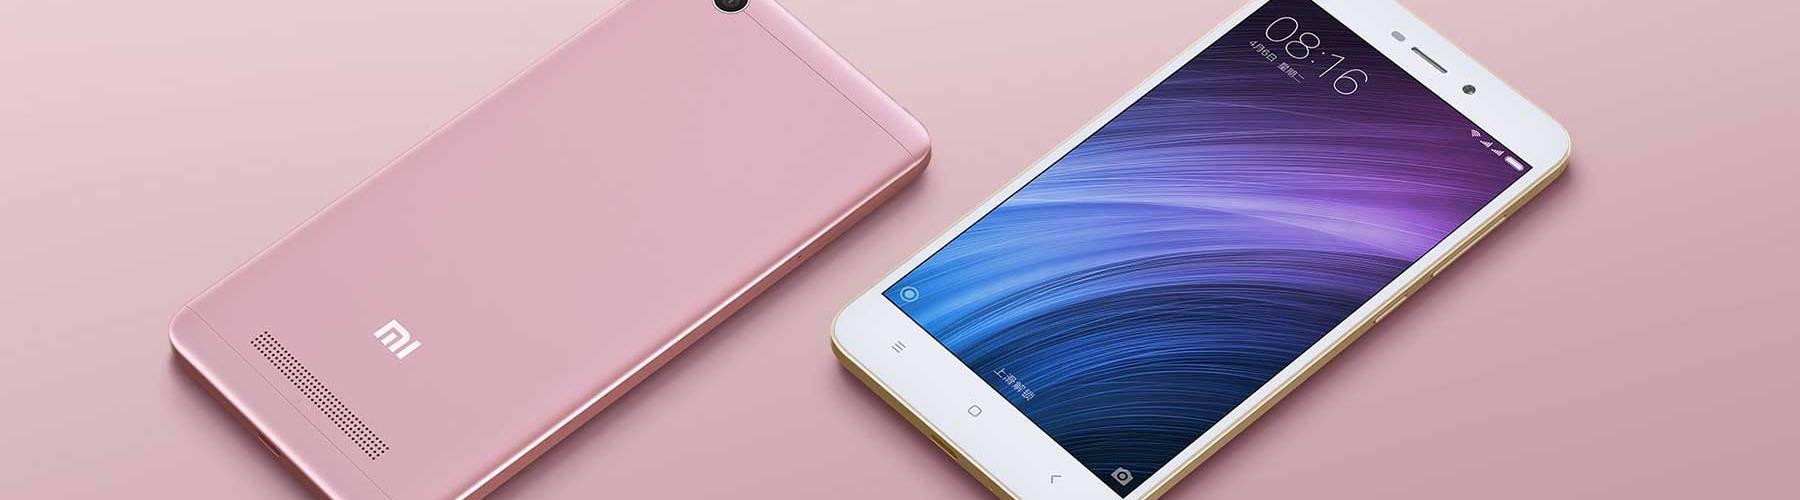 Xiaomi Redmi 4A - Beleza Rosa